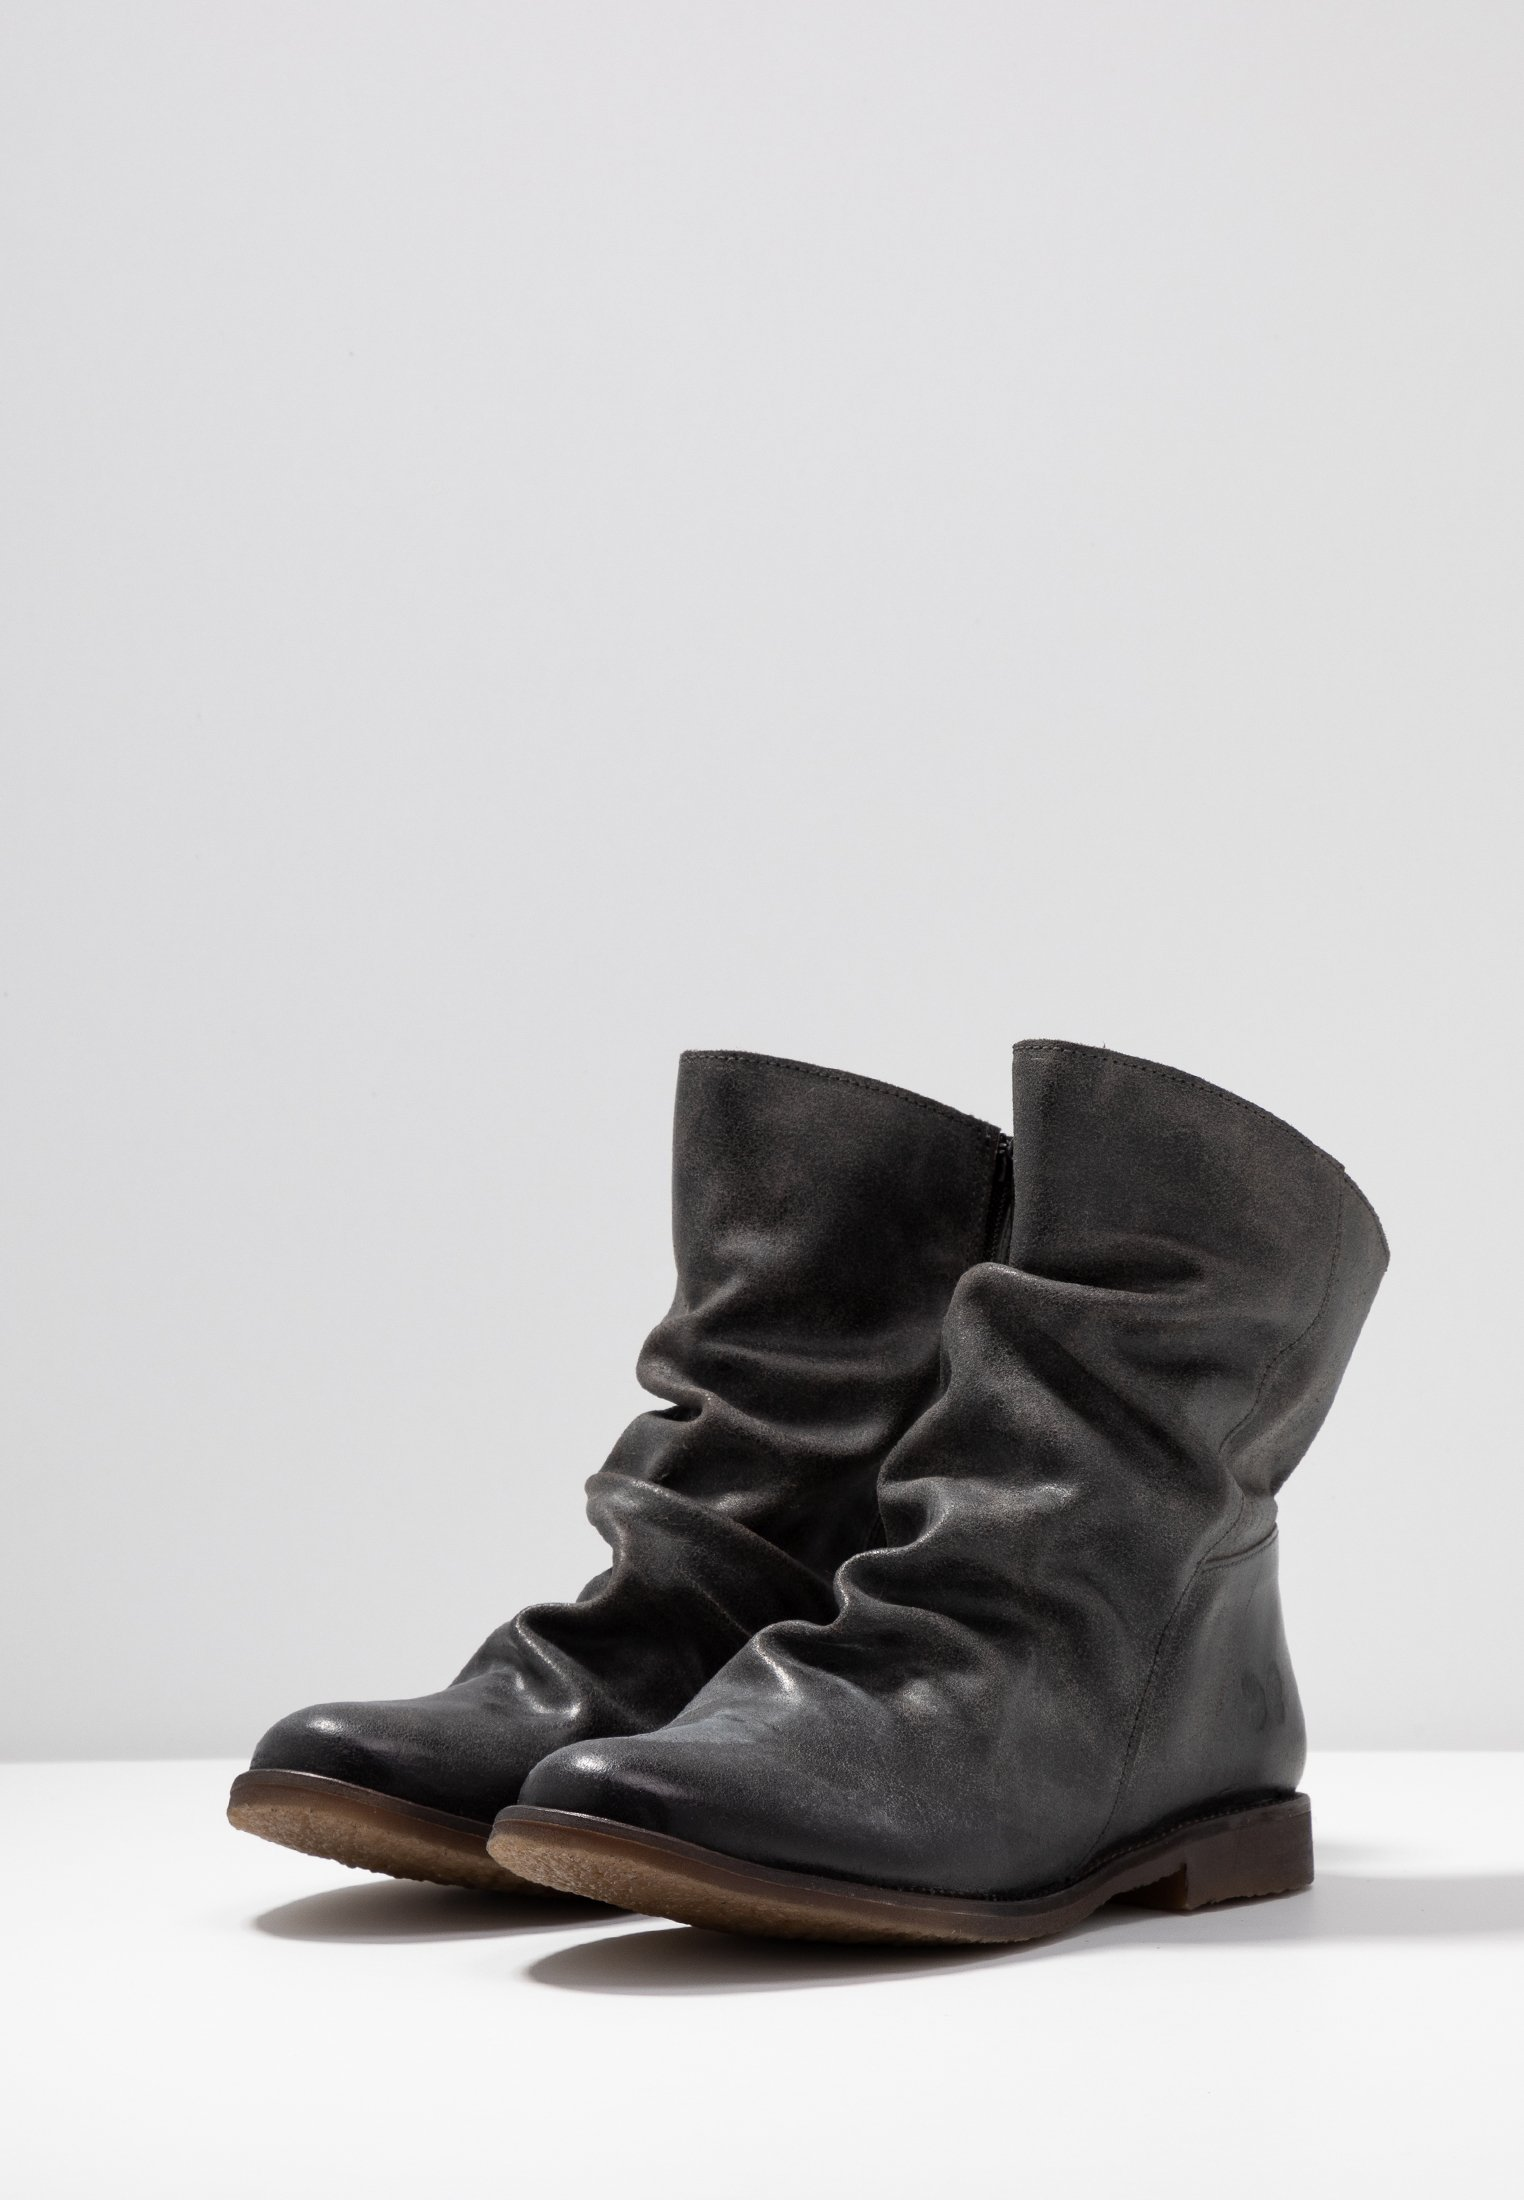 Felmini Wide Fit CLASH - Stiefelette - zenia fango | Damen Schuhe 2020